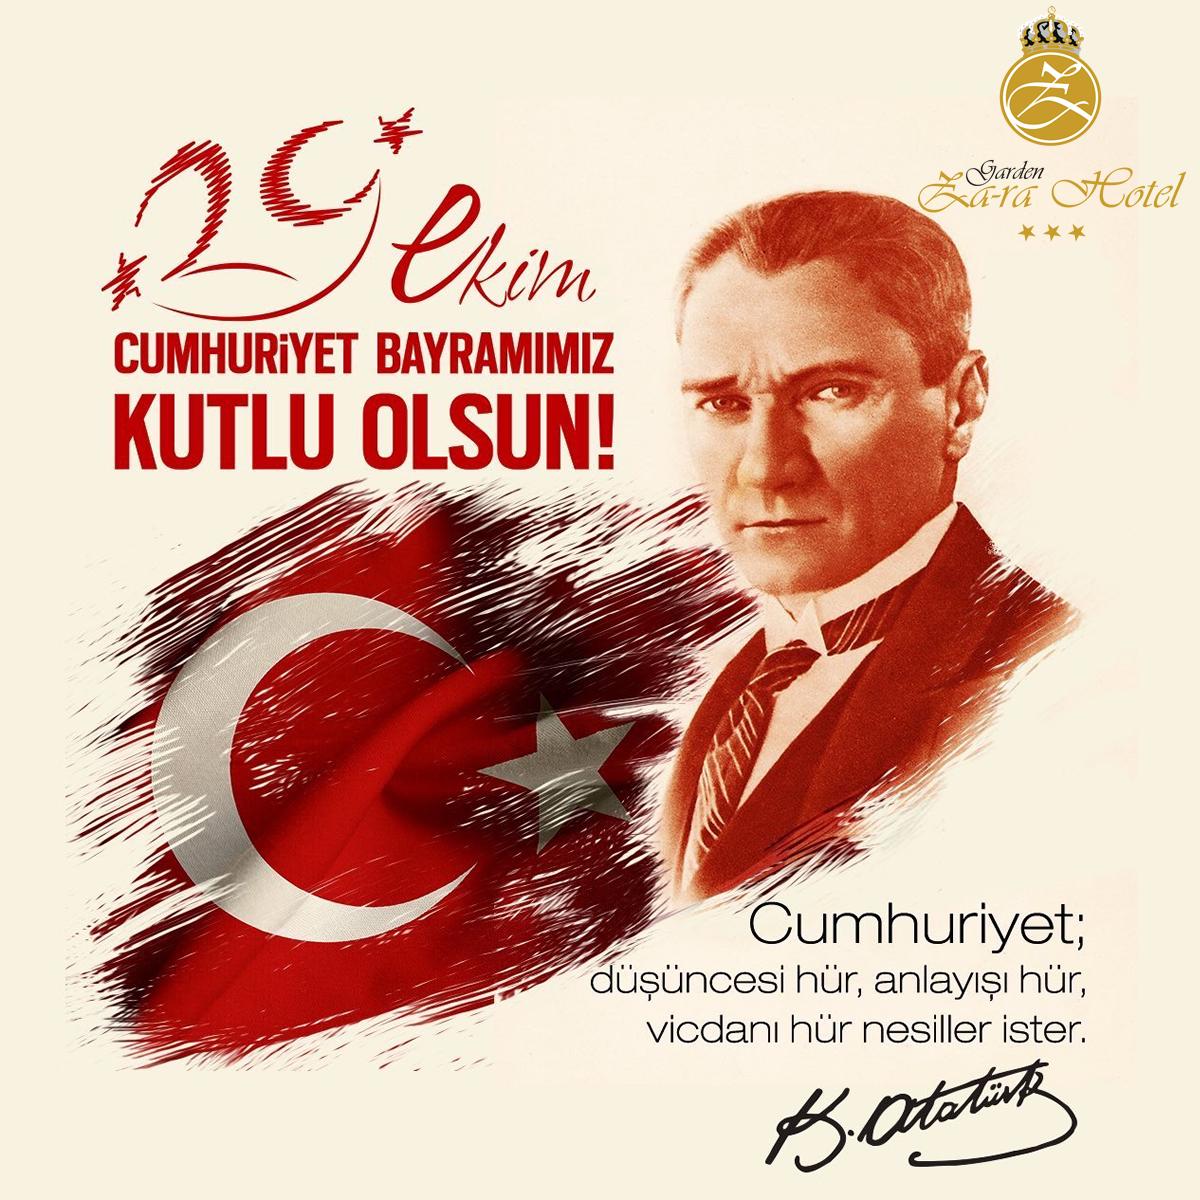 29 Ekim Cumhuriyet Bayramı!